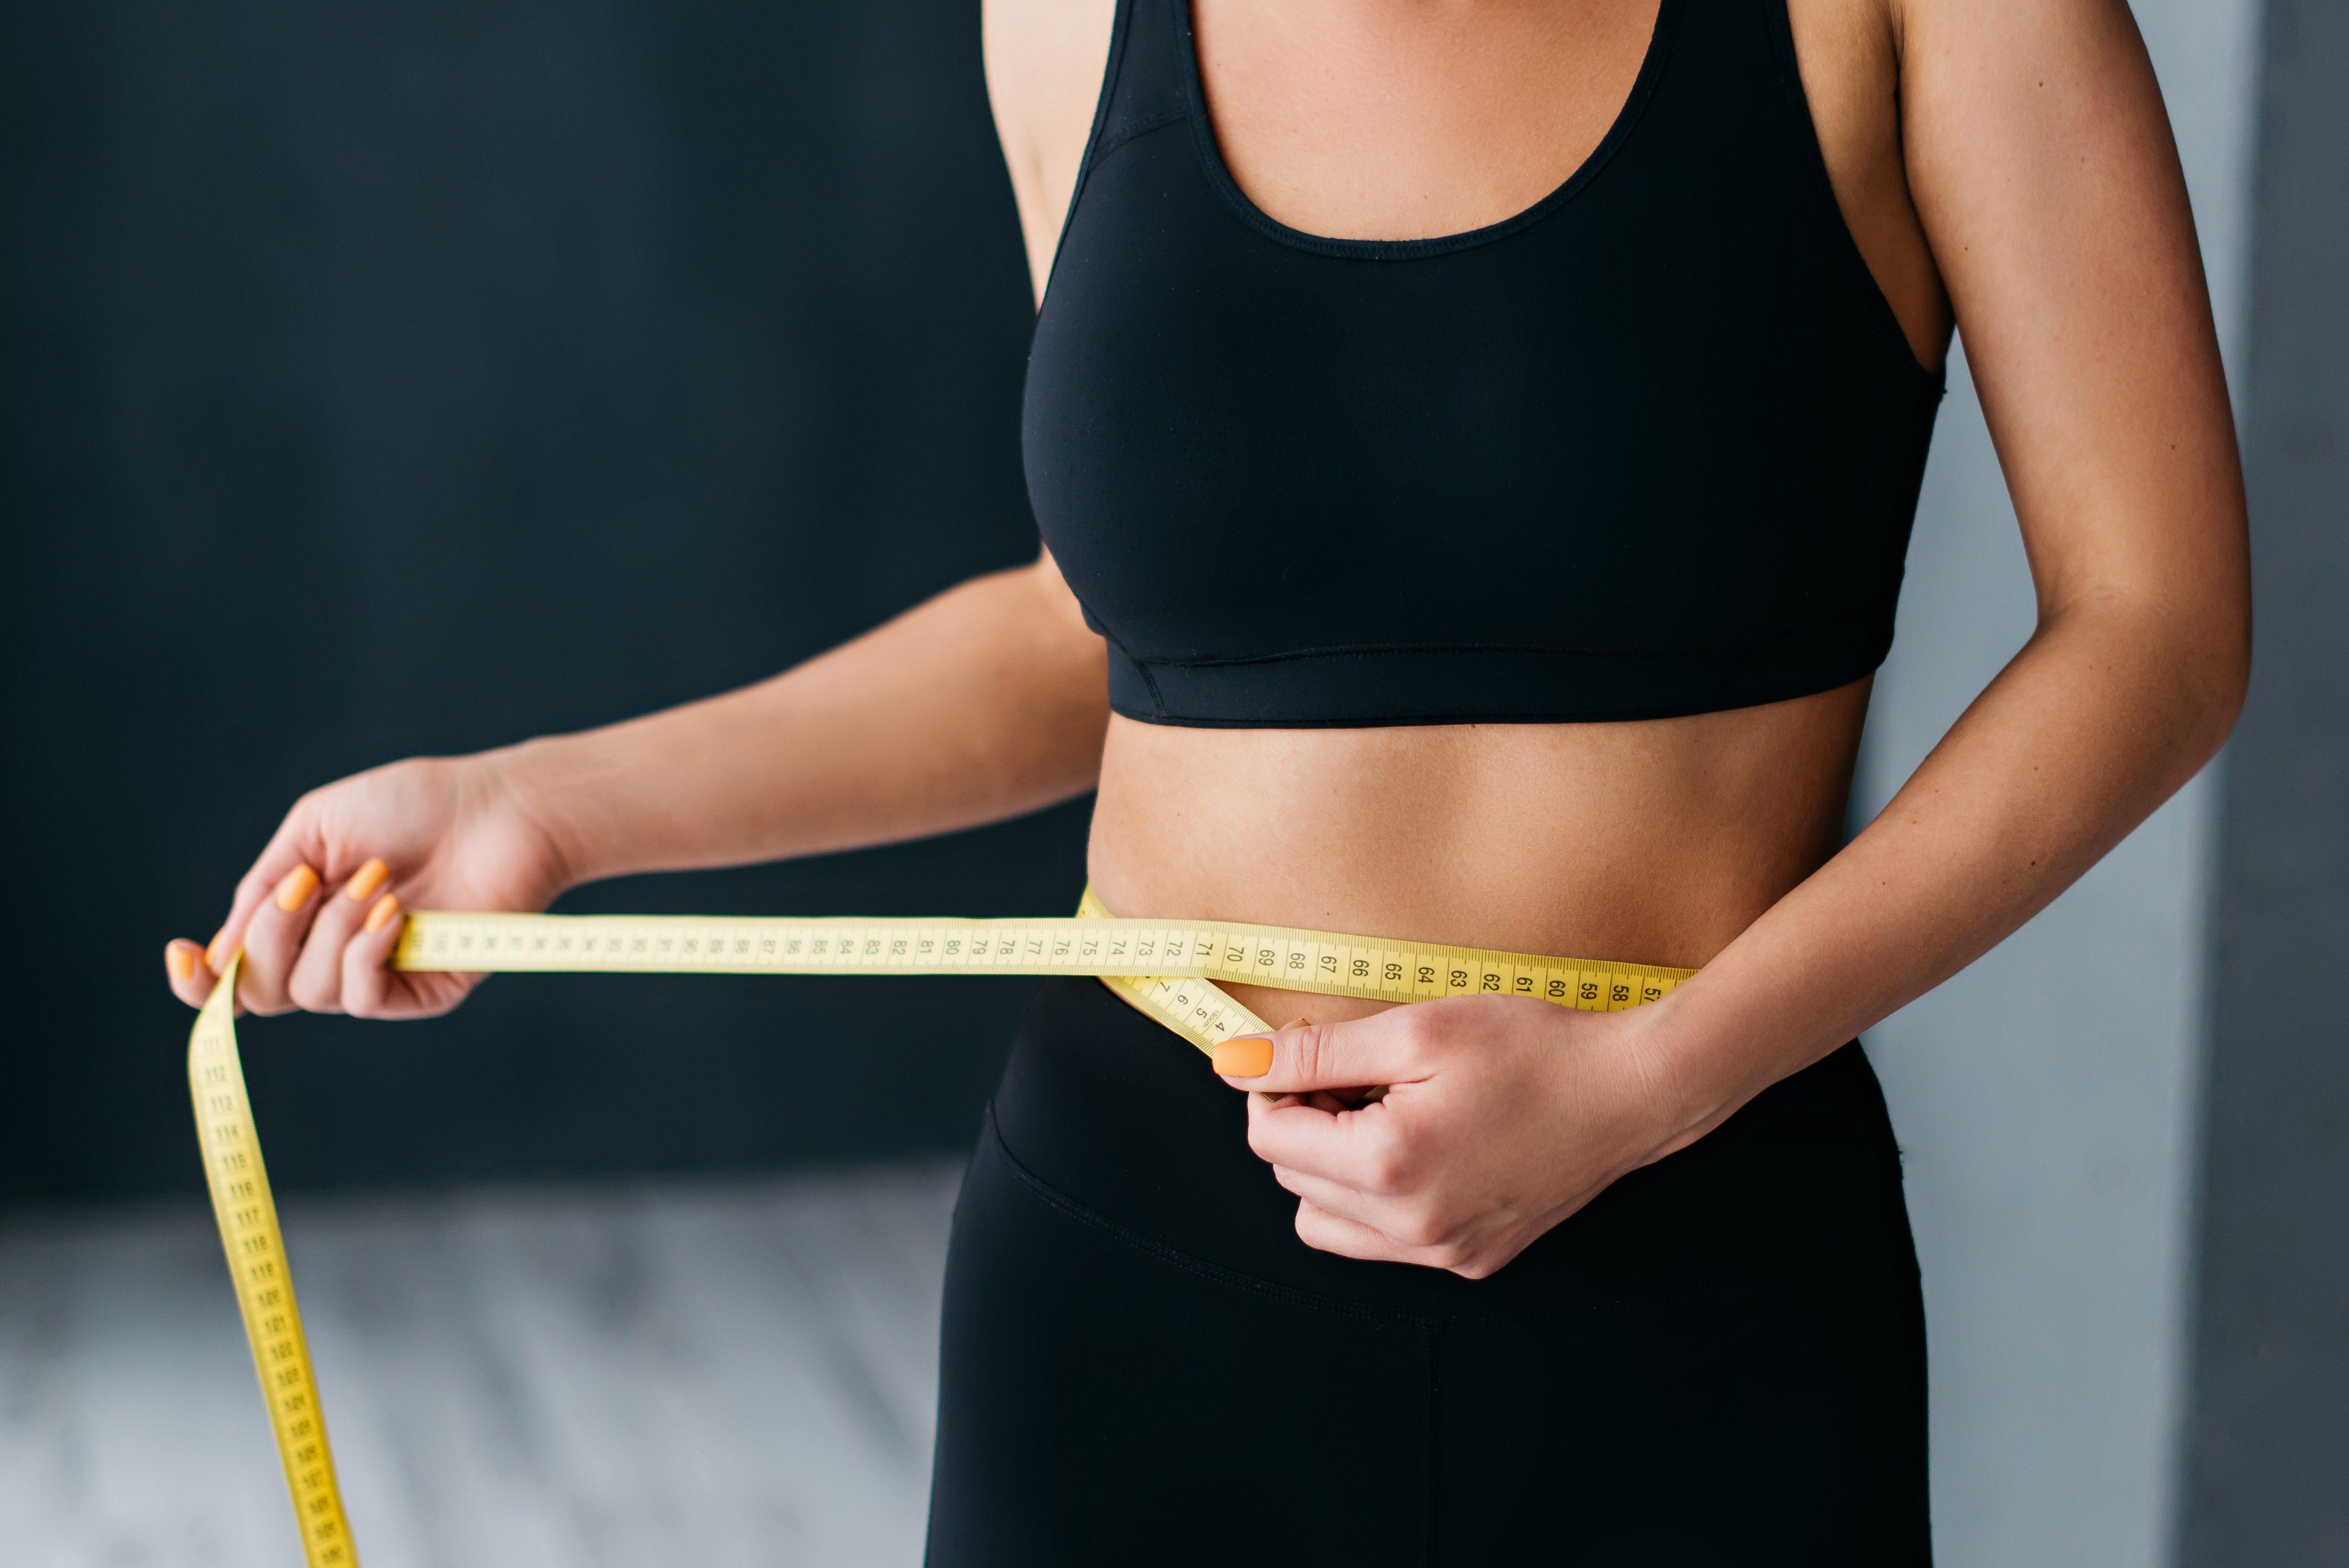 Woman in black sports bra and leggings measuring her waist